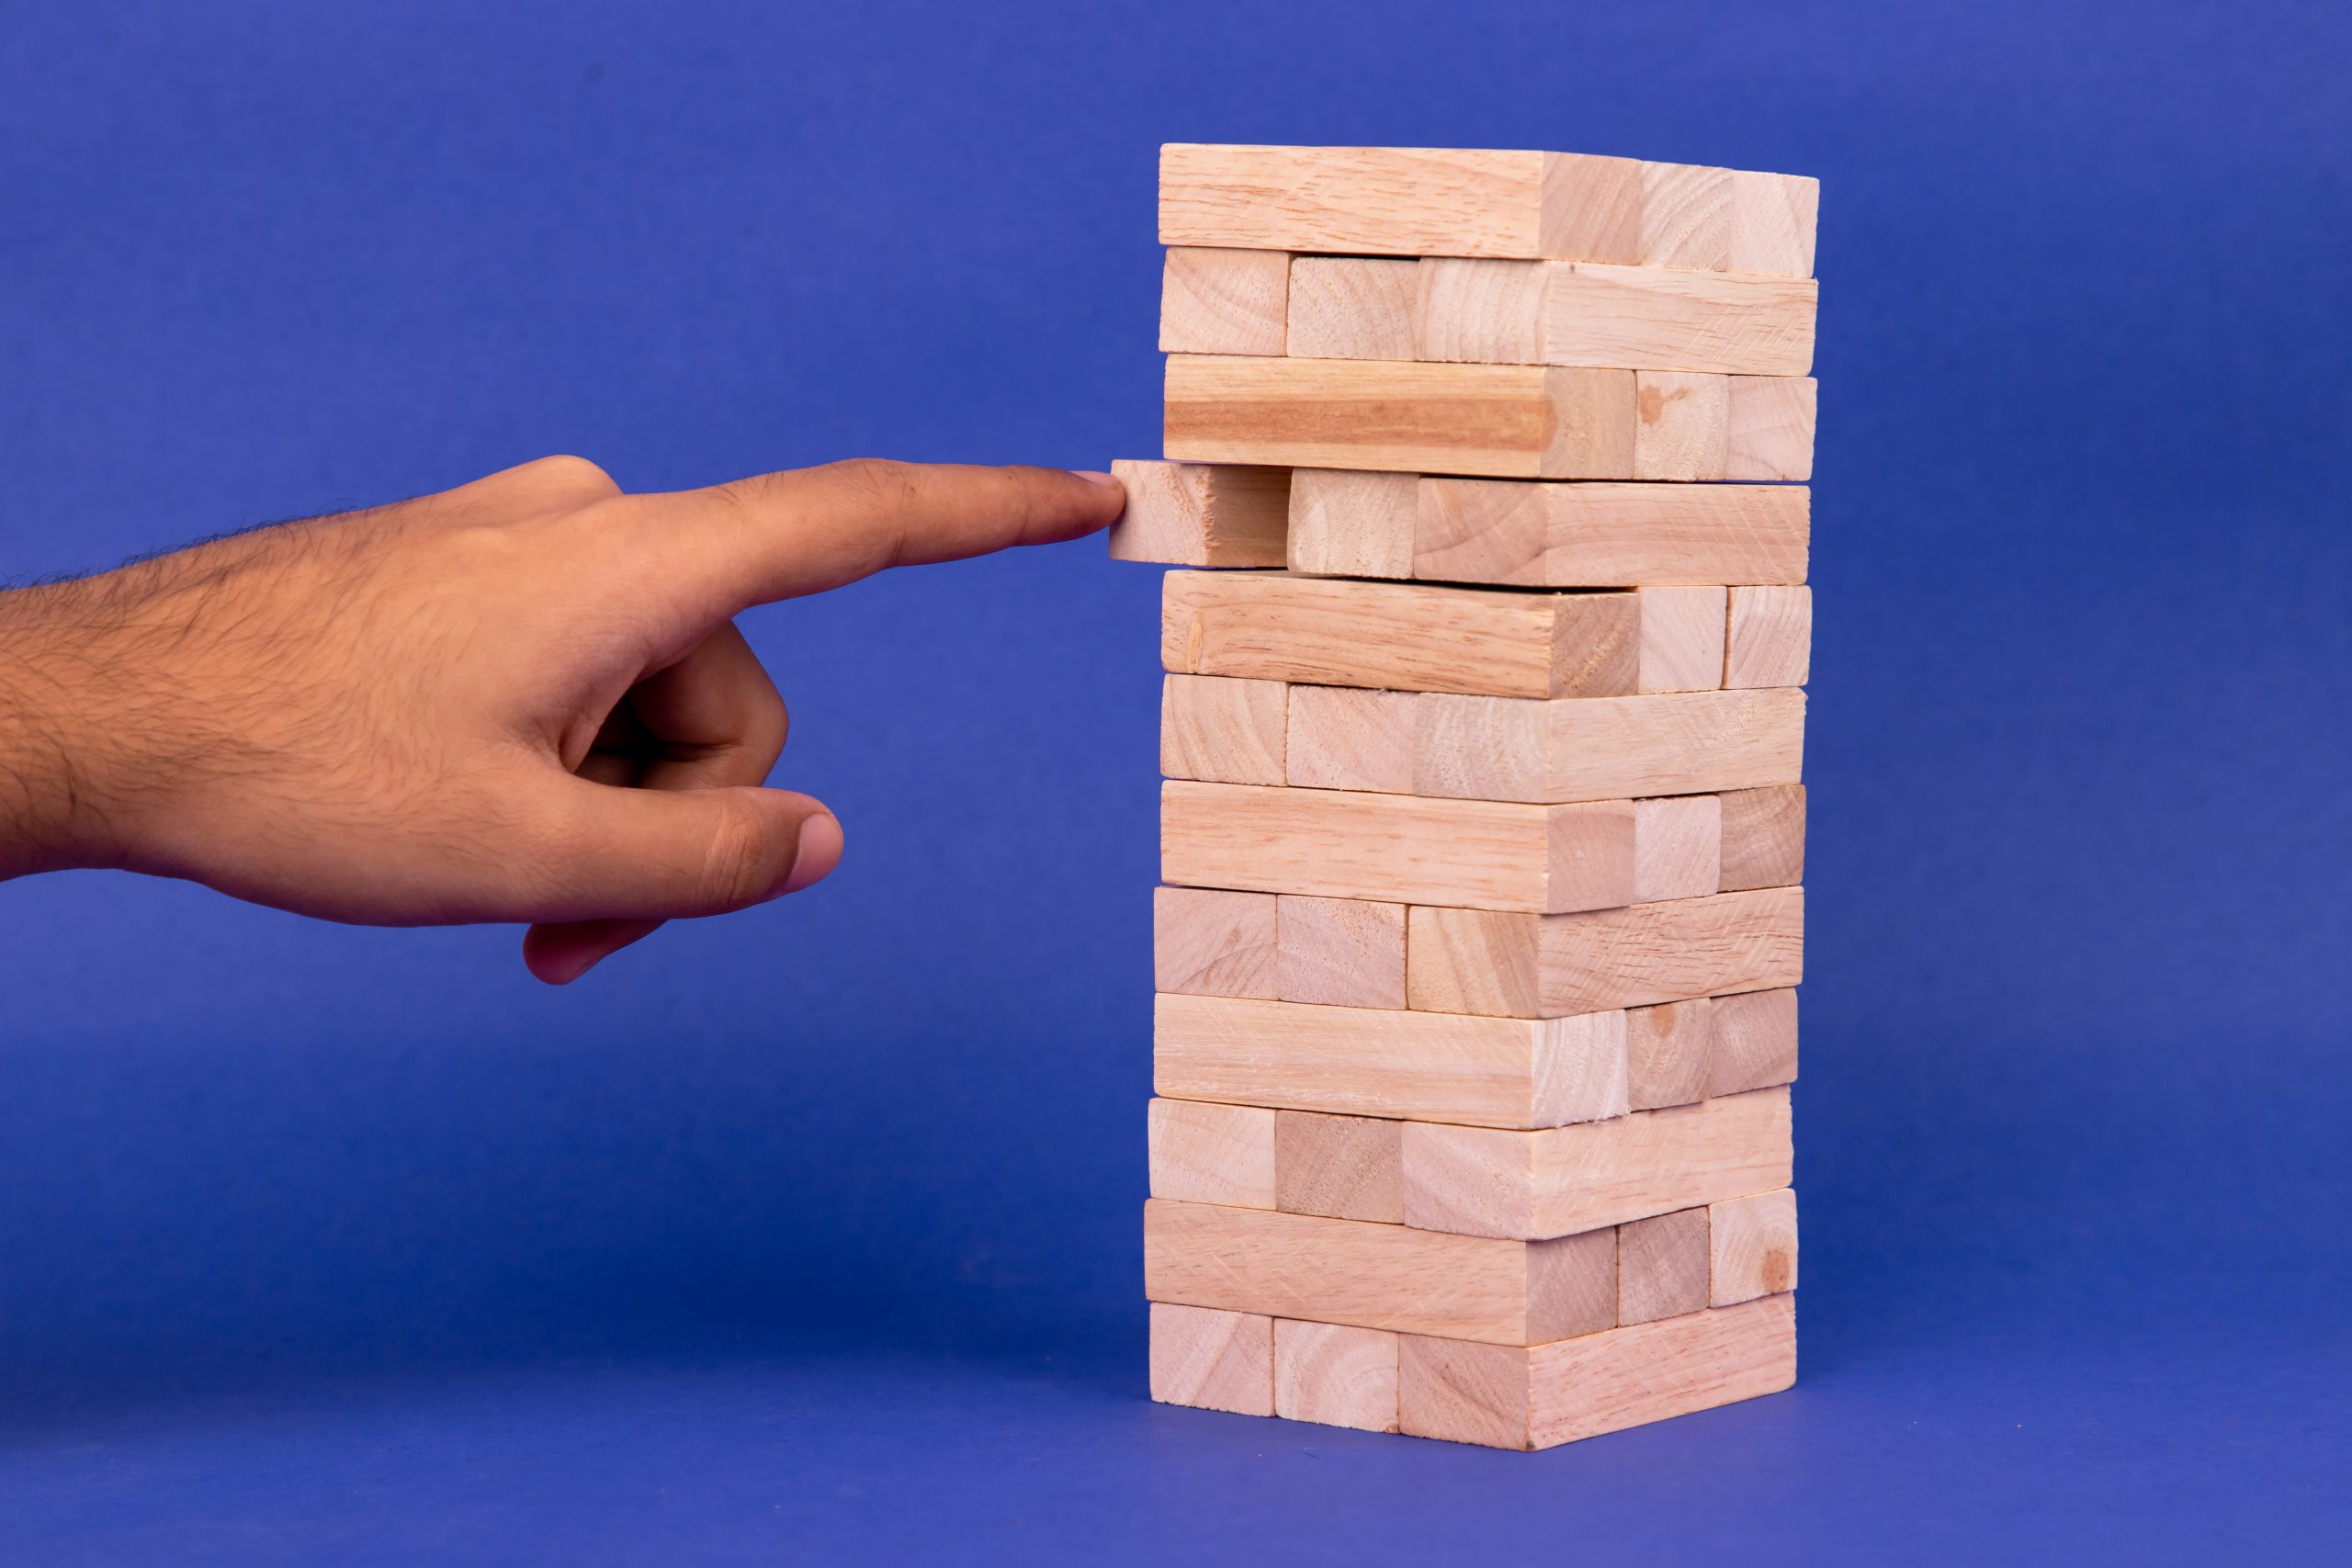 Hand sliding a piece of jenga